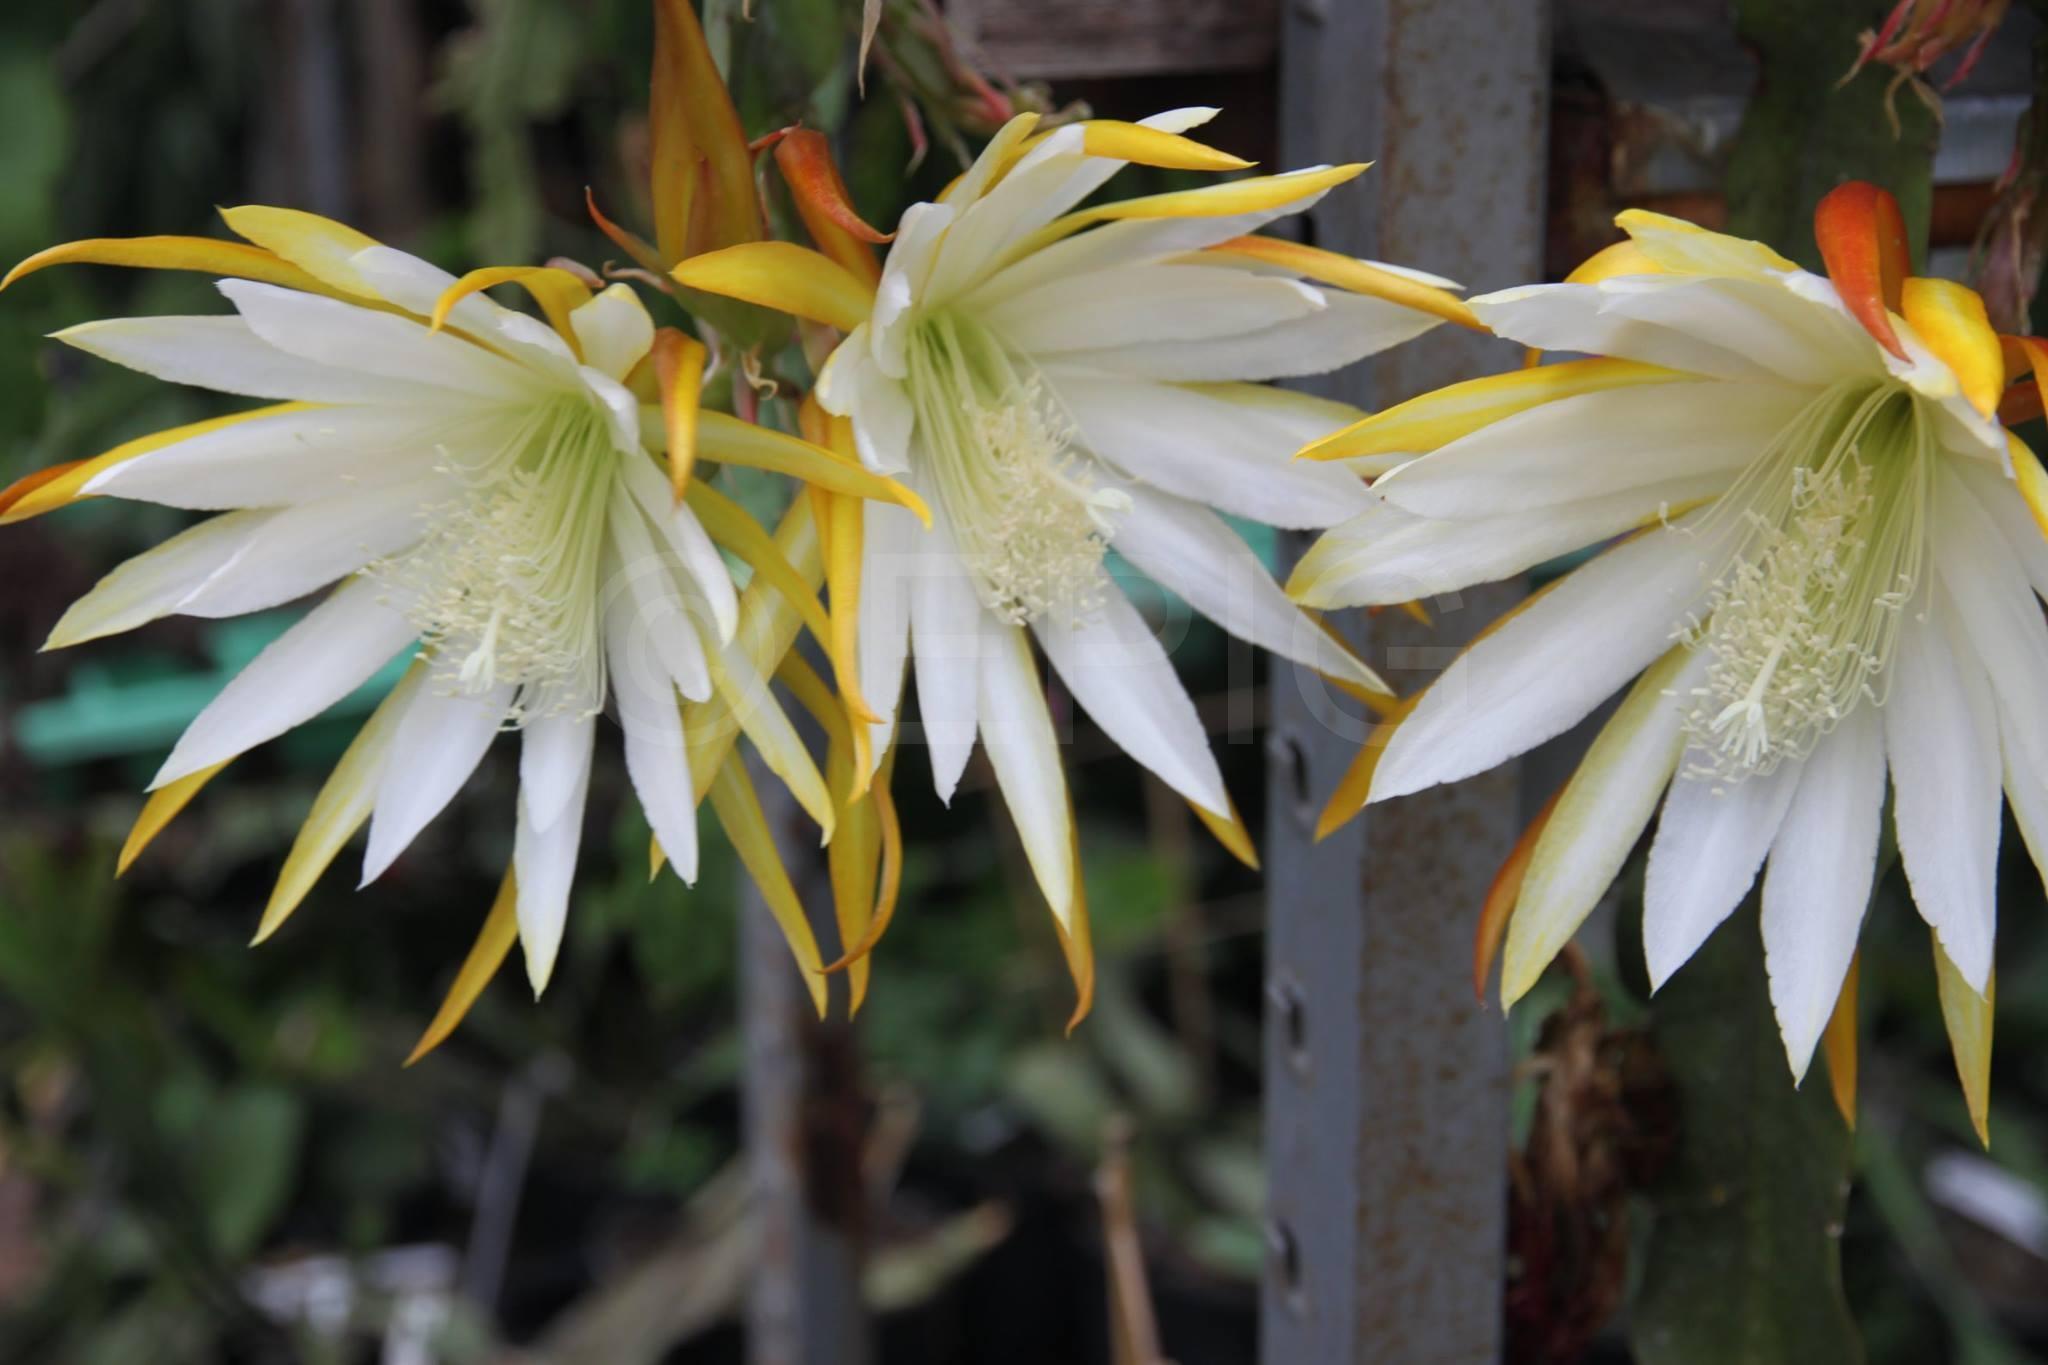 Epikaktus 'White Splendor' (Foto Heinz Peter Mohrdieck)